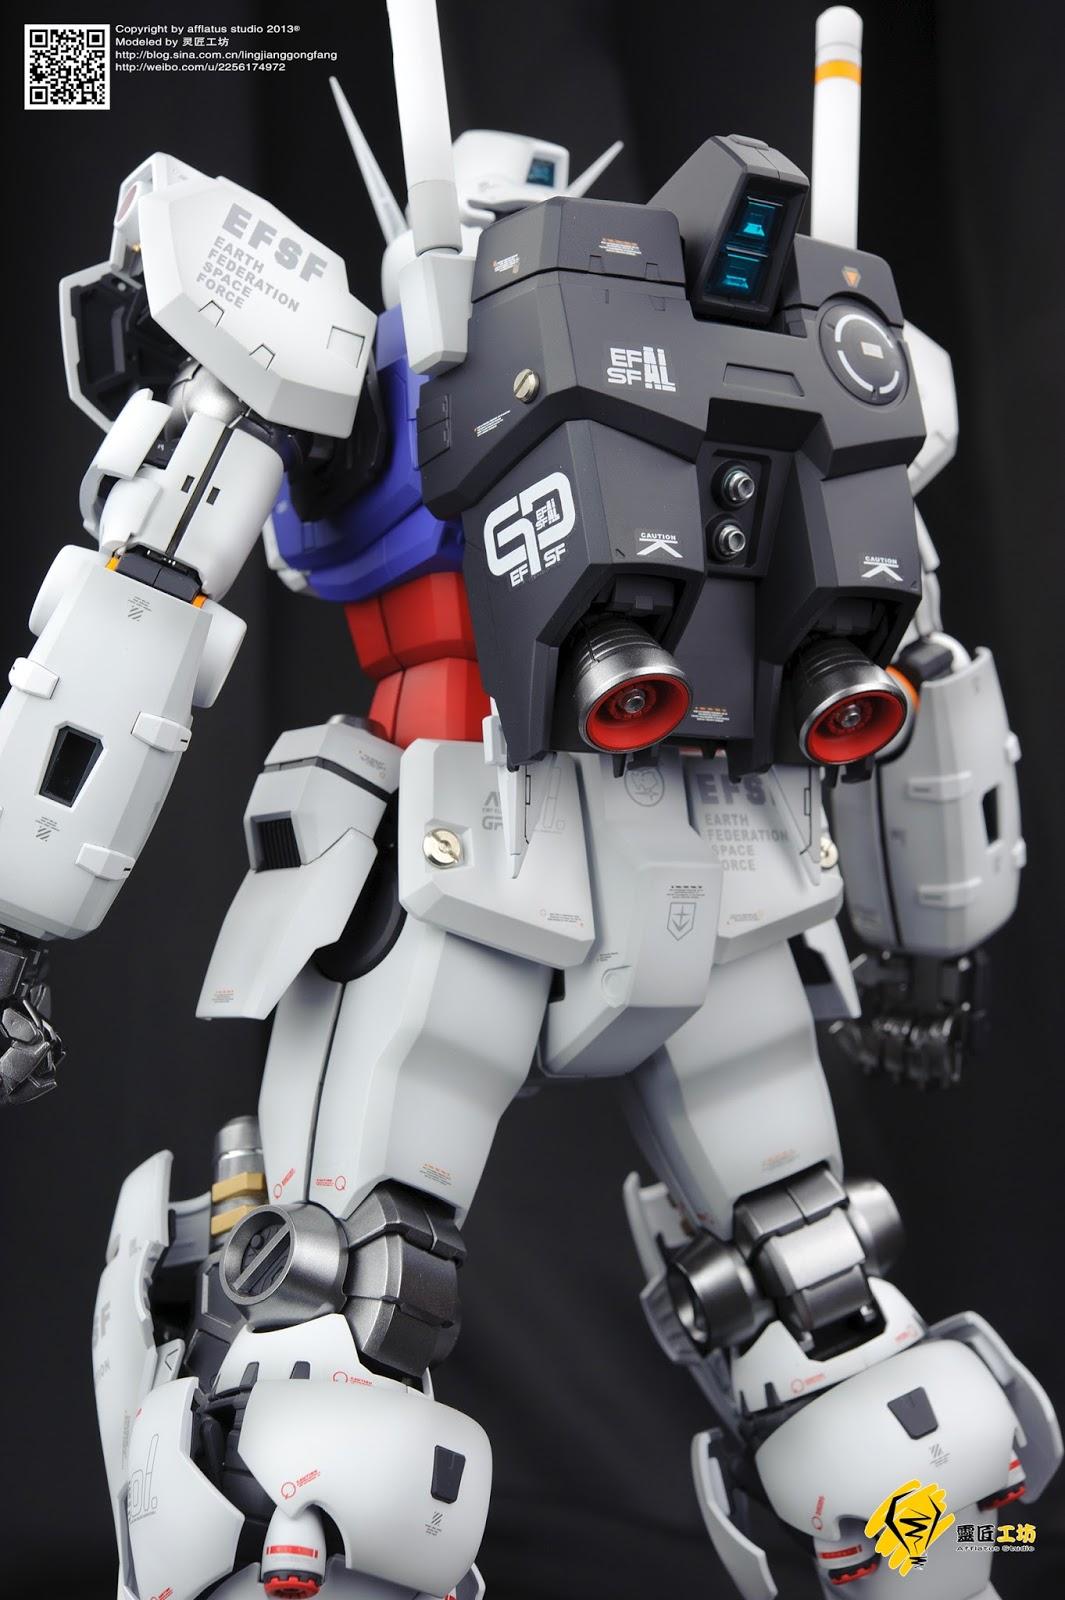 Gundam Family: MG 1/100 RX-78GP01 Gundam GP01 Zephyranthes